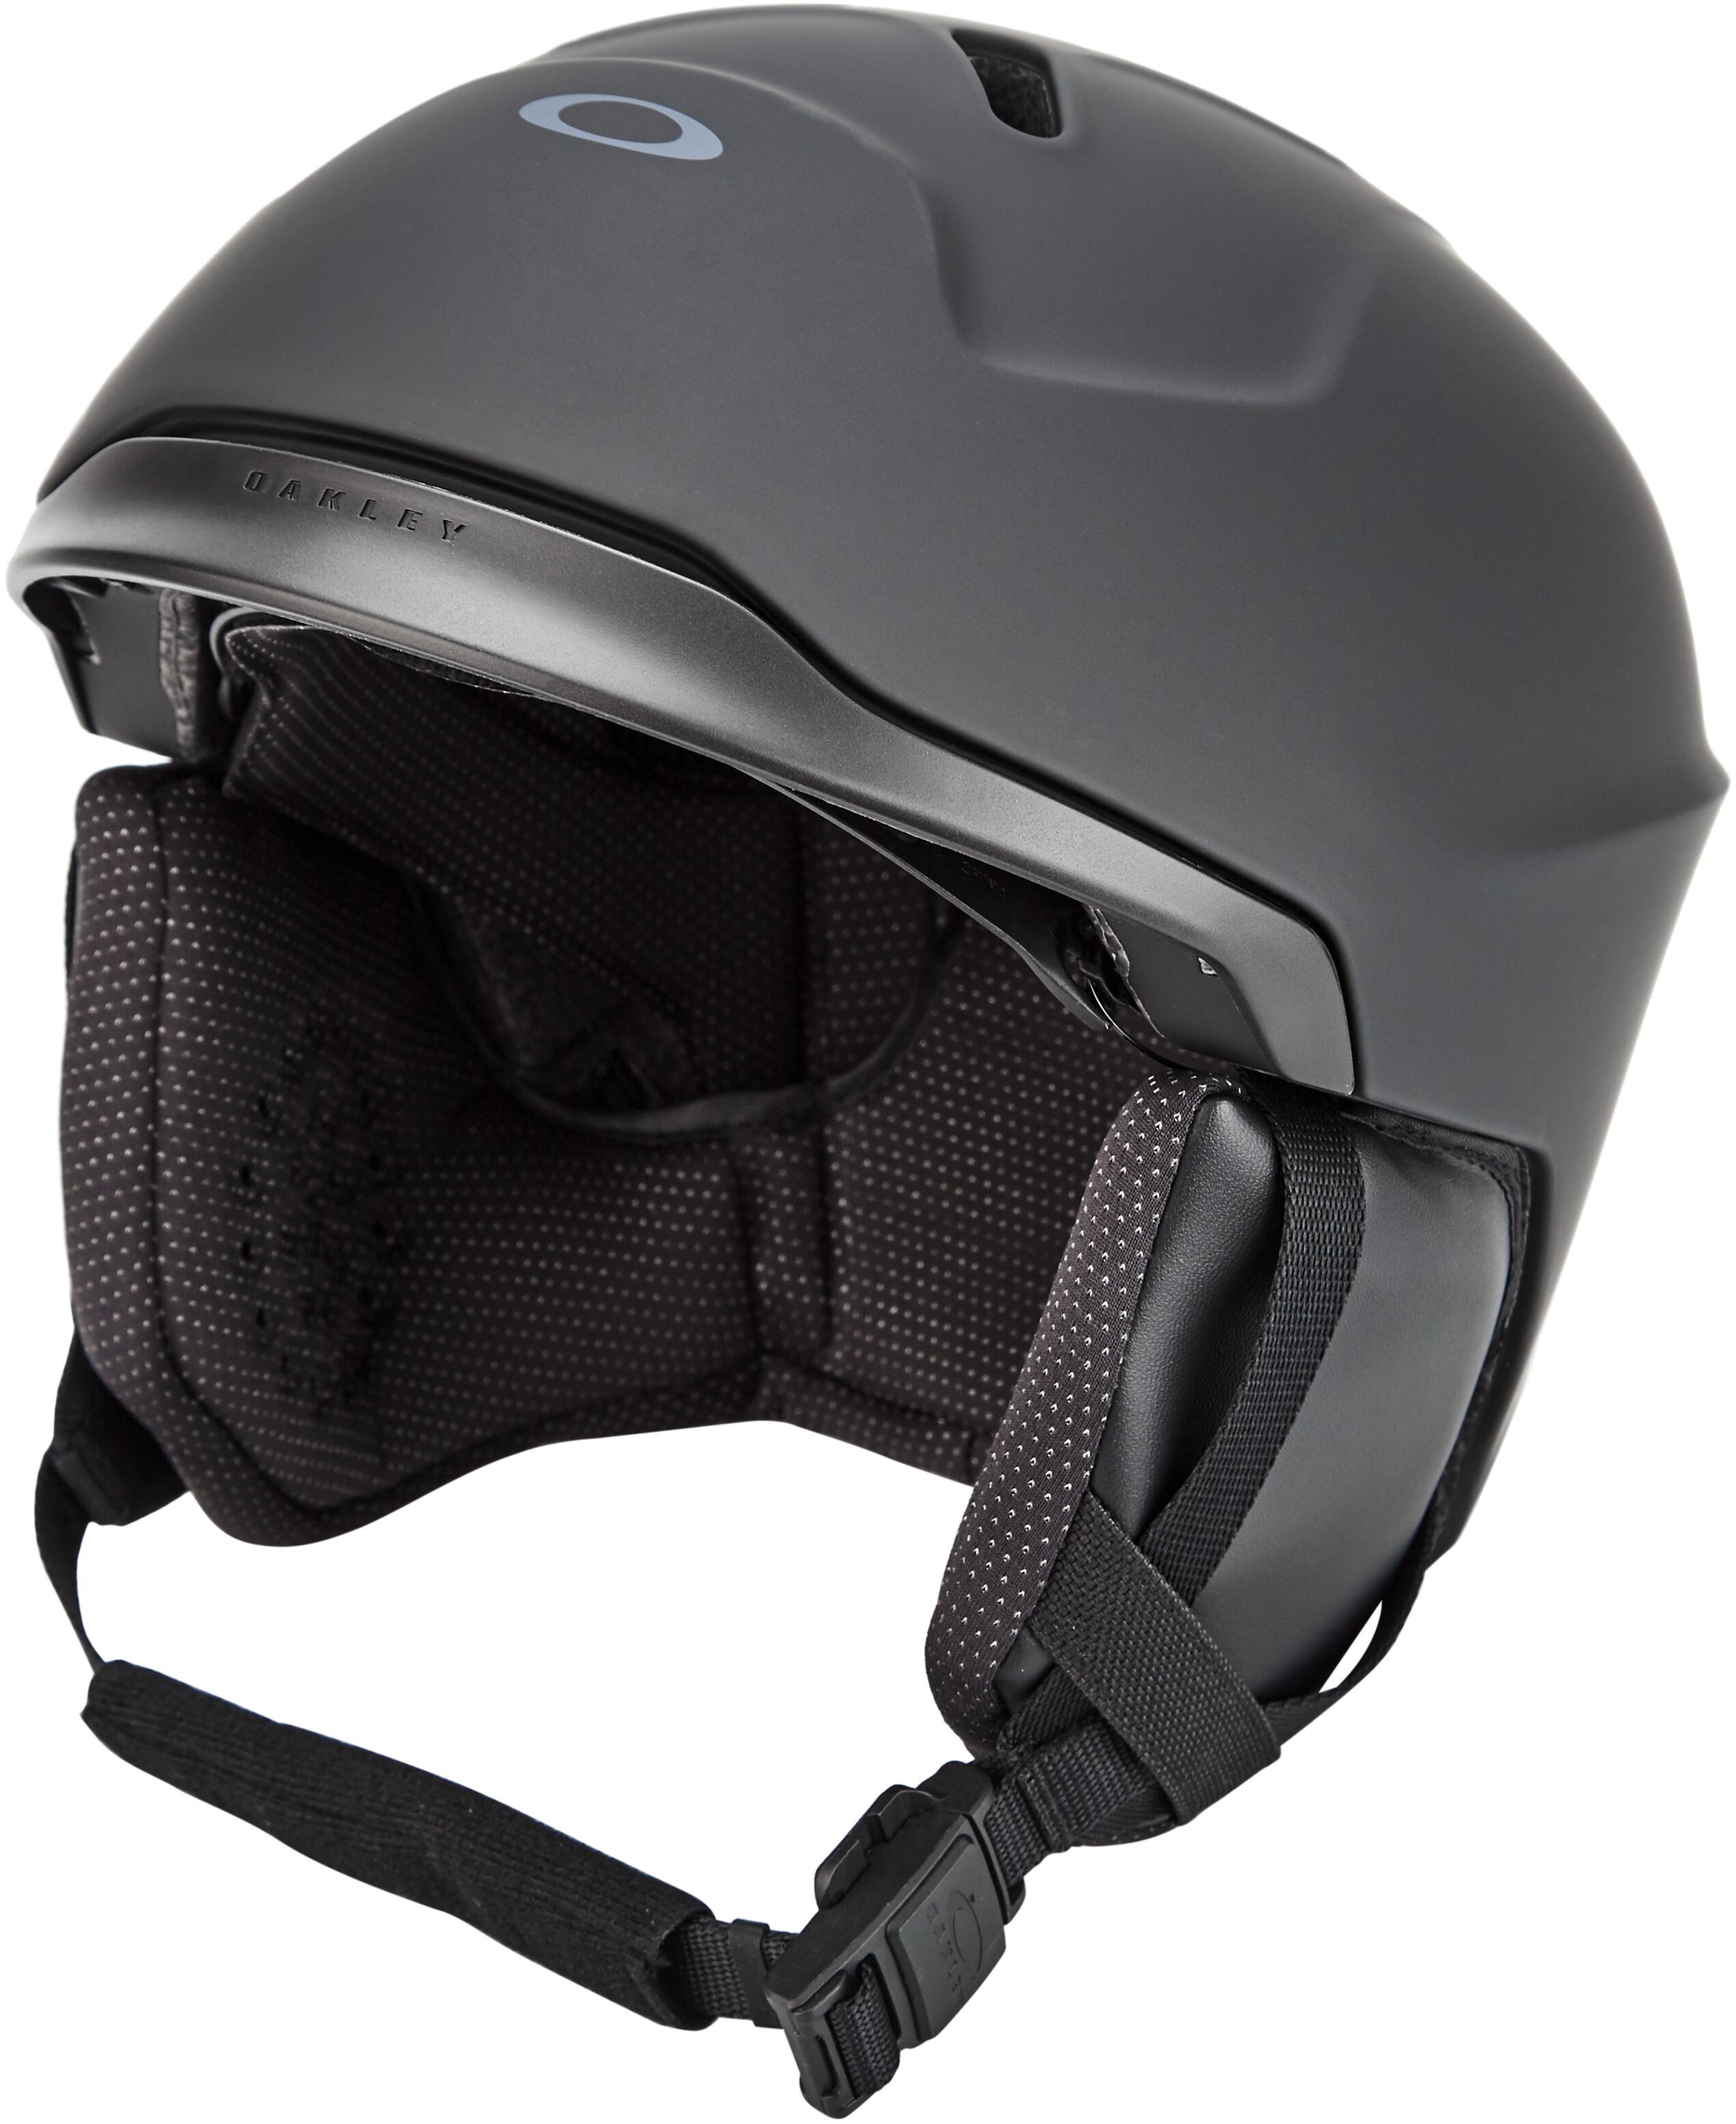 f6c73b2cea2 Oakley MOD 3 MIPS Snow Helmet Blackout - addnature.com